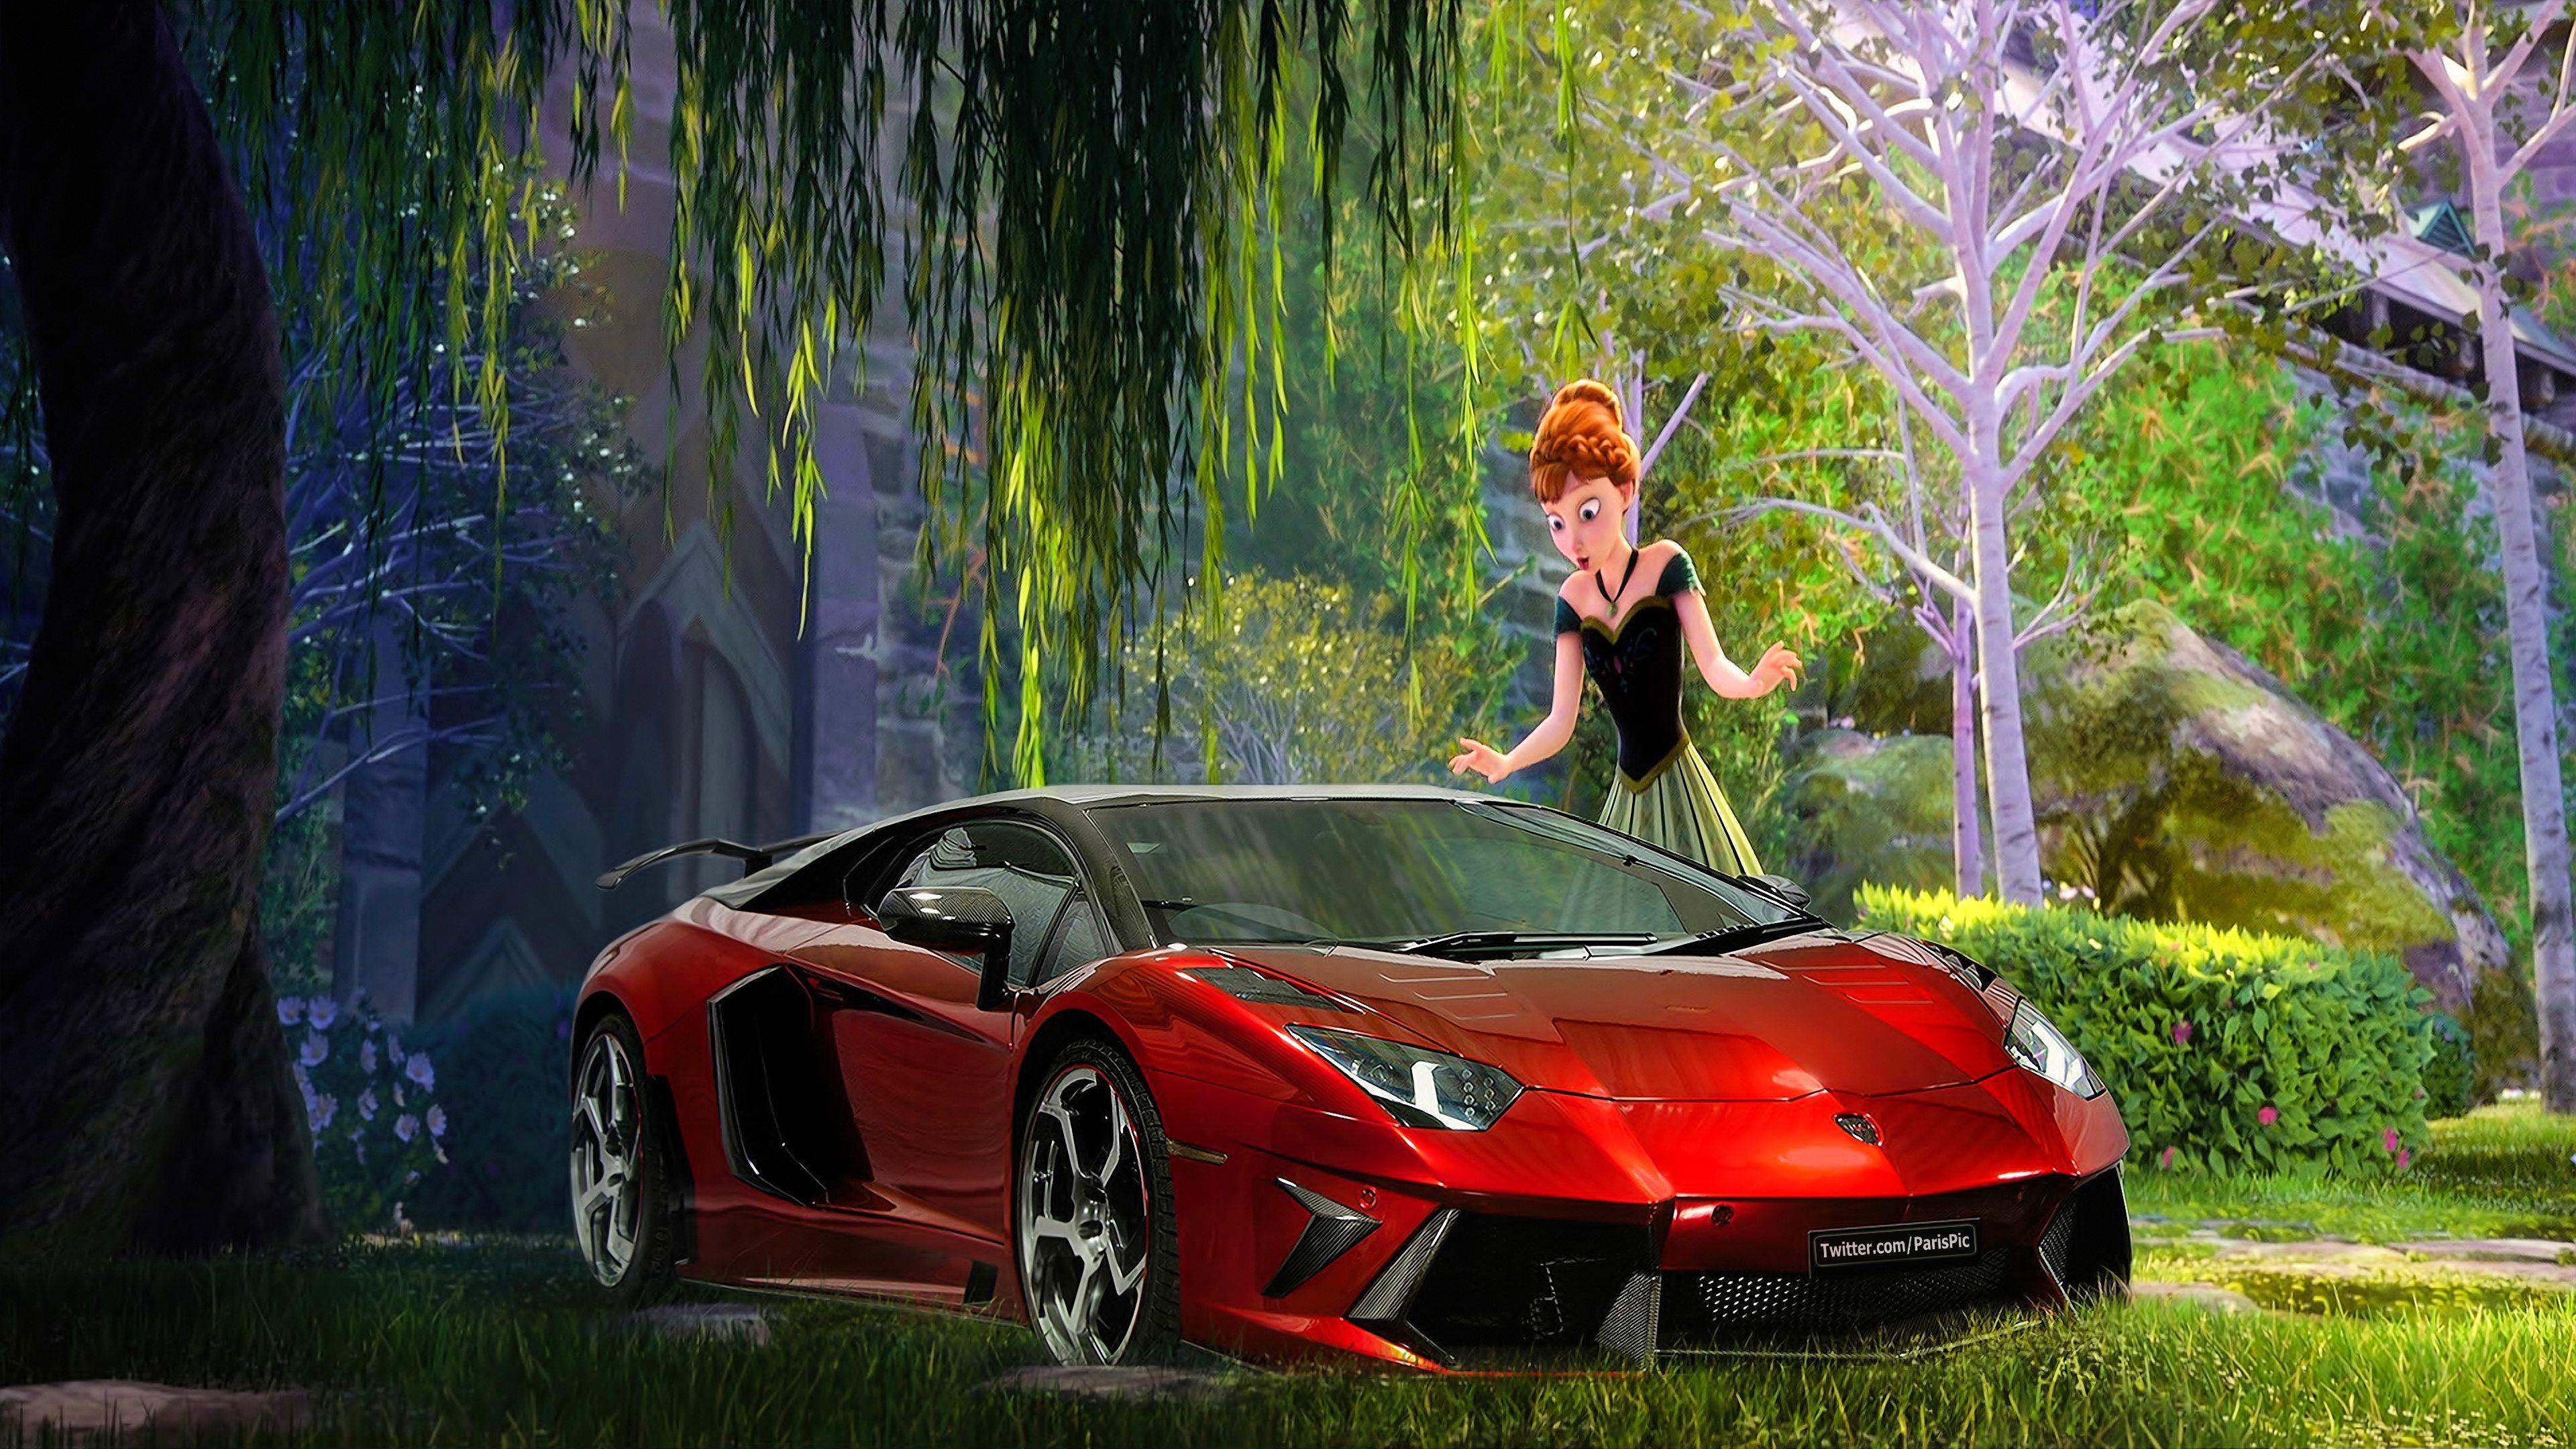 Frozen Anna Elsa 2013 Wallpaper Lamborghini 4K ParisPic   Disney 3840x2160